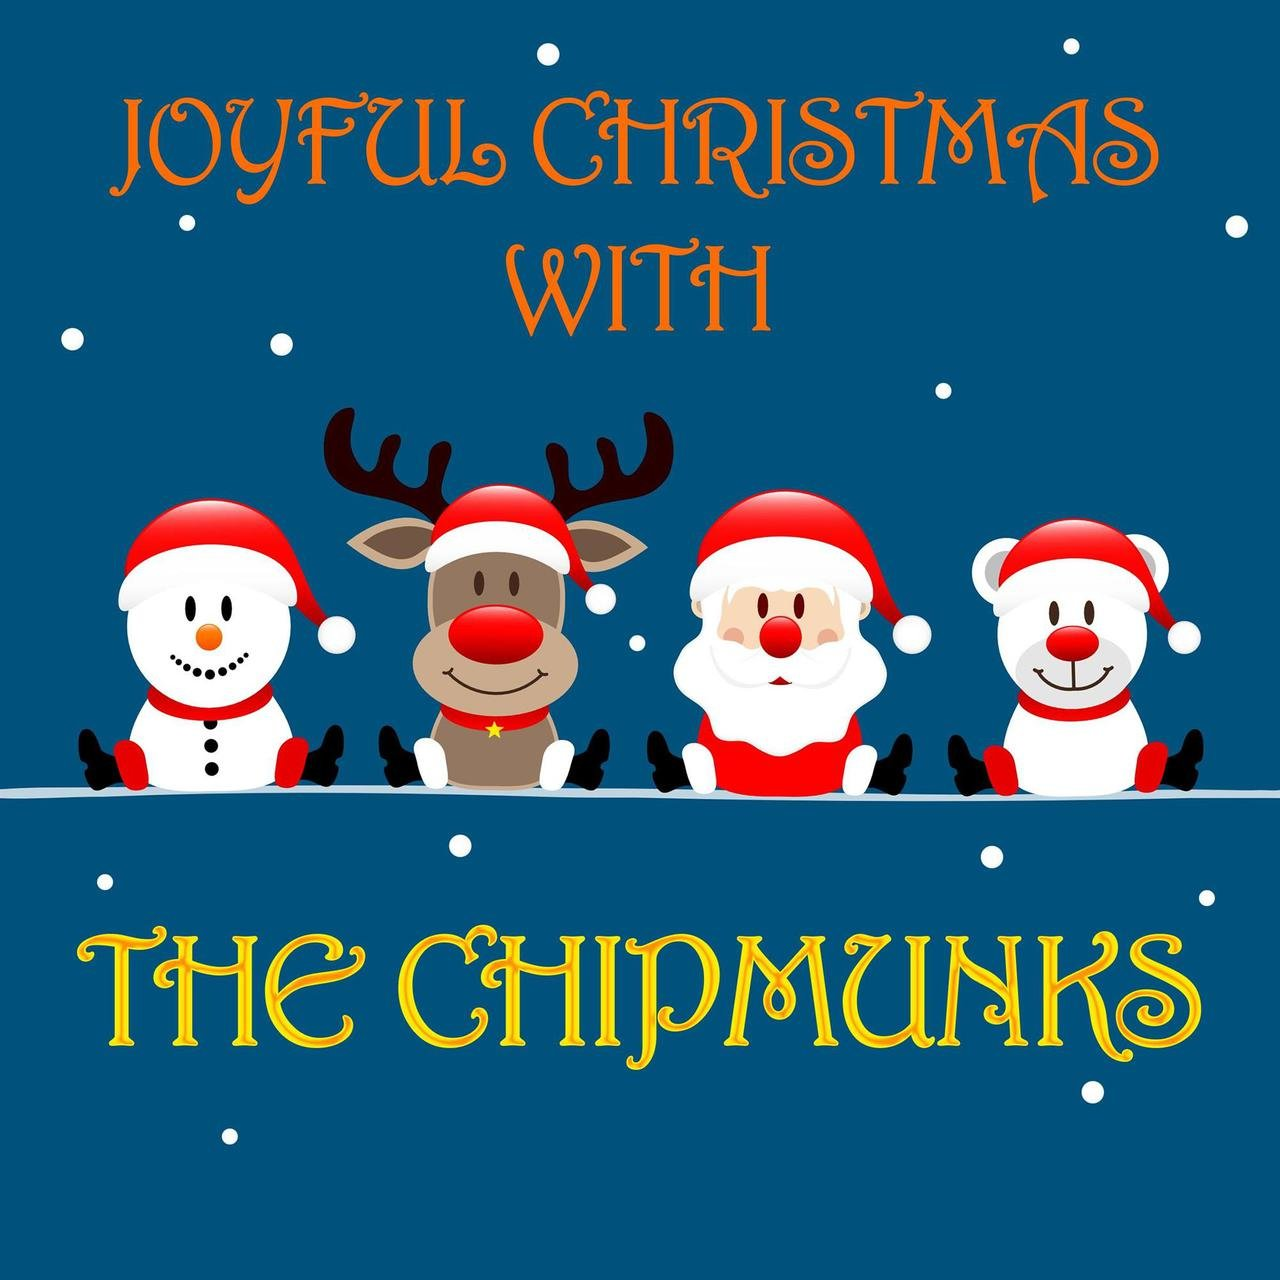 TIDAL: Listen to Joyful Christmas With The Chipmunks on TIDAL